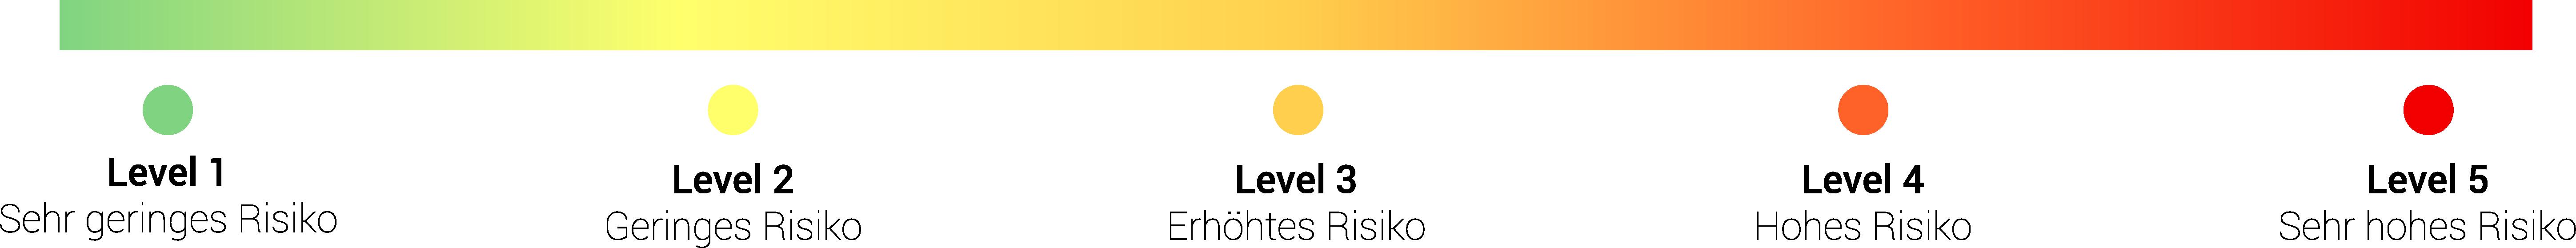 Skala